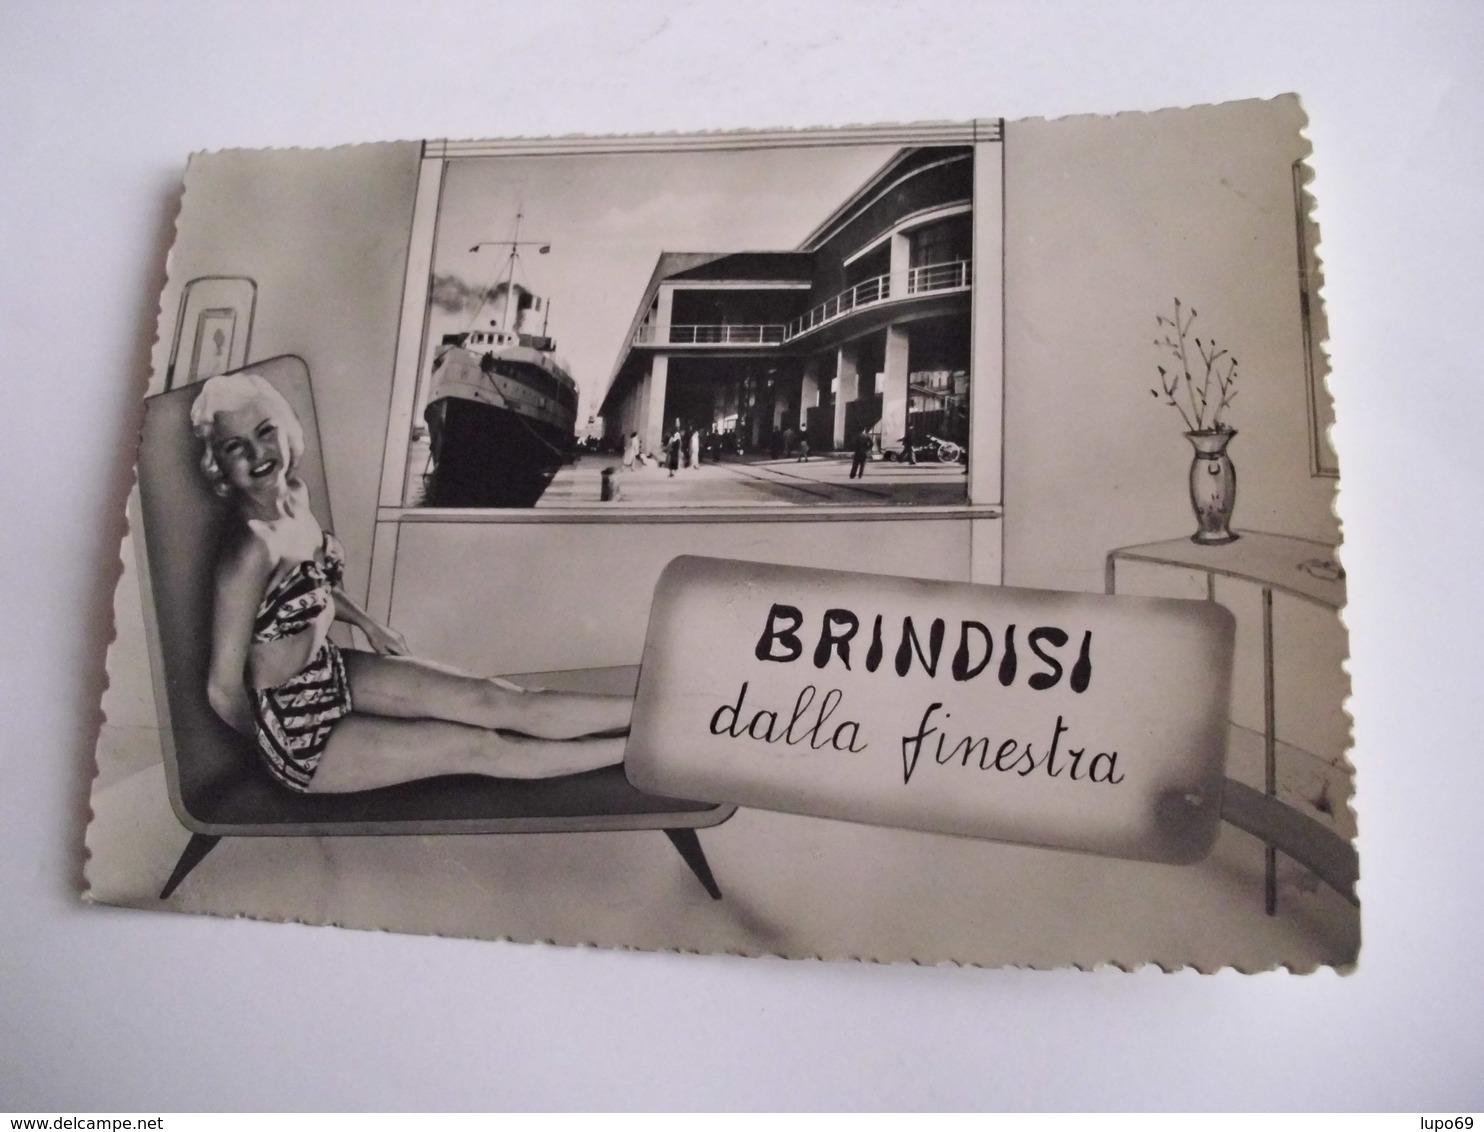 Brindisi - Dalla Finestra - Brindisi